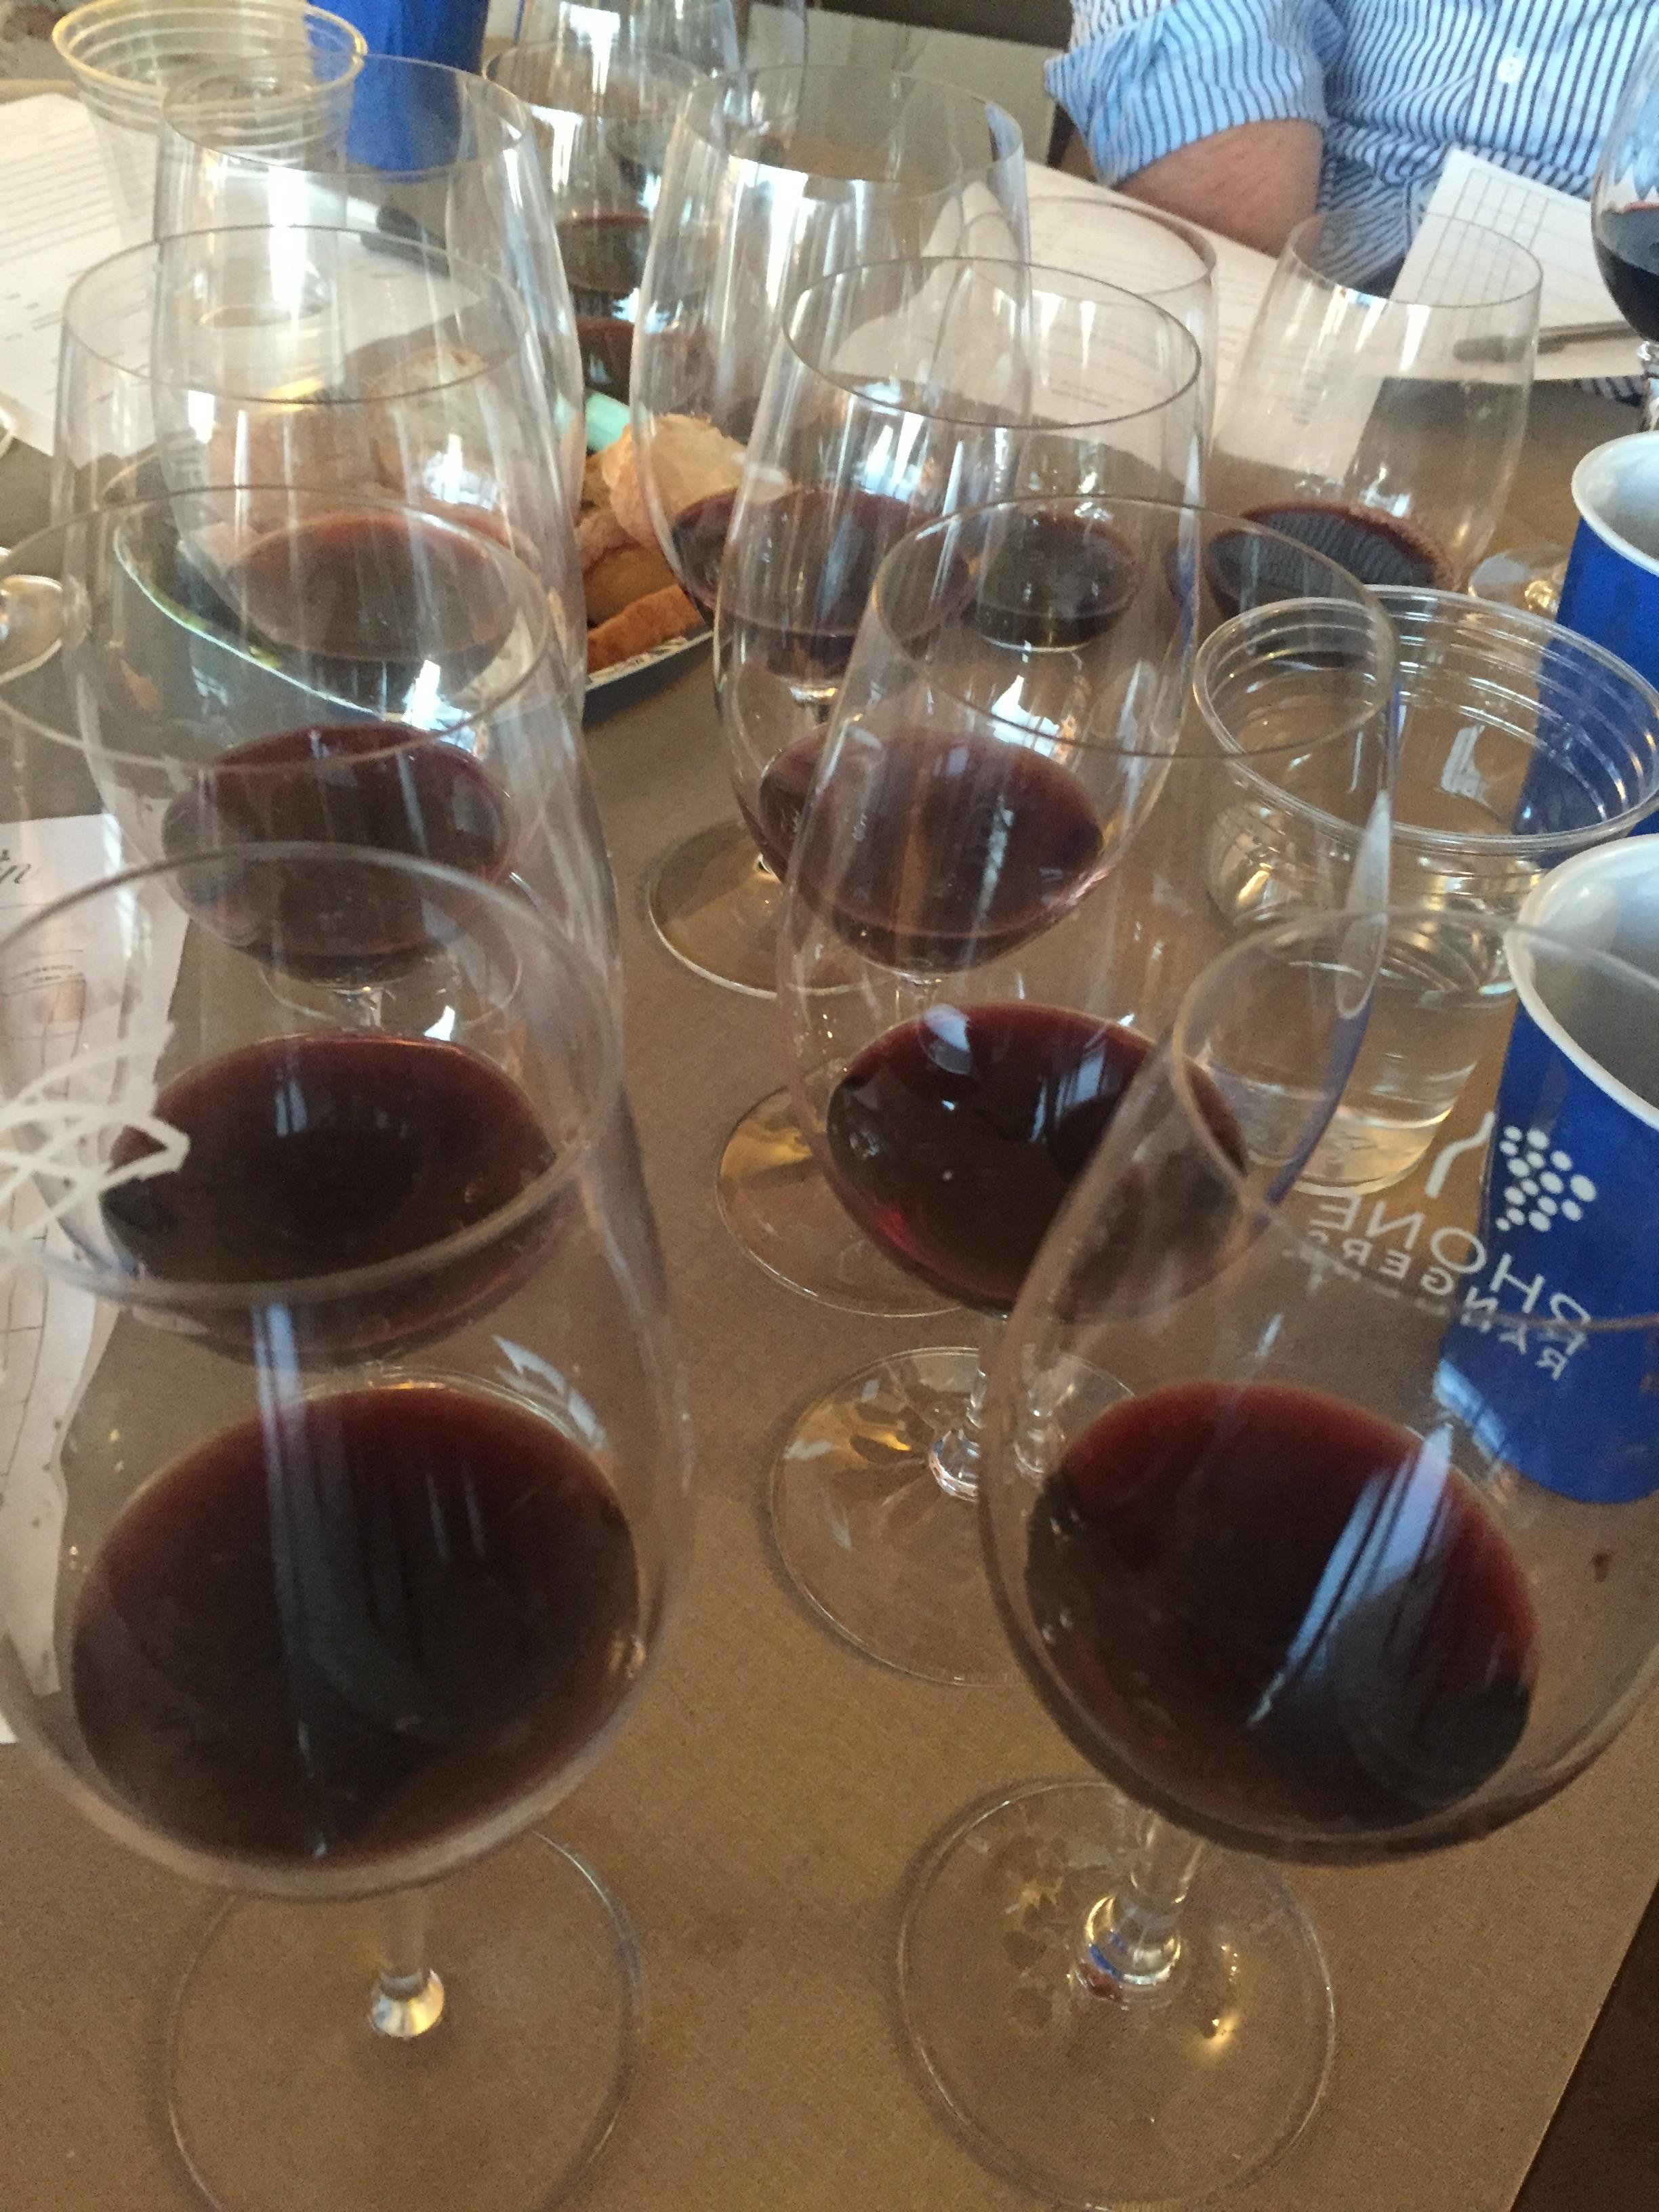 eight Mourvèdre-based wines